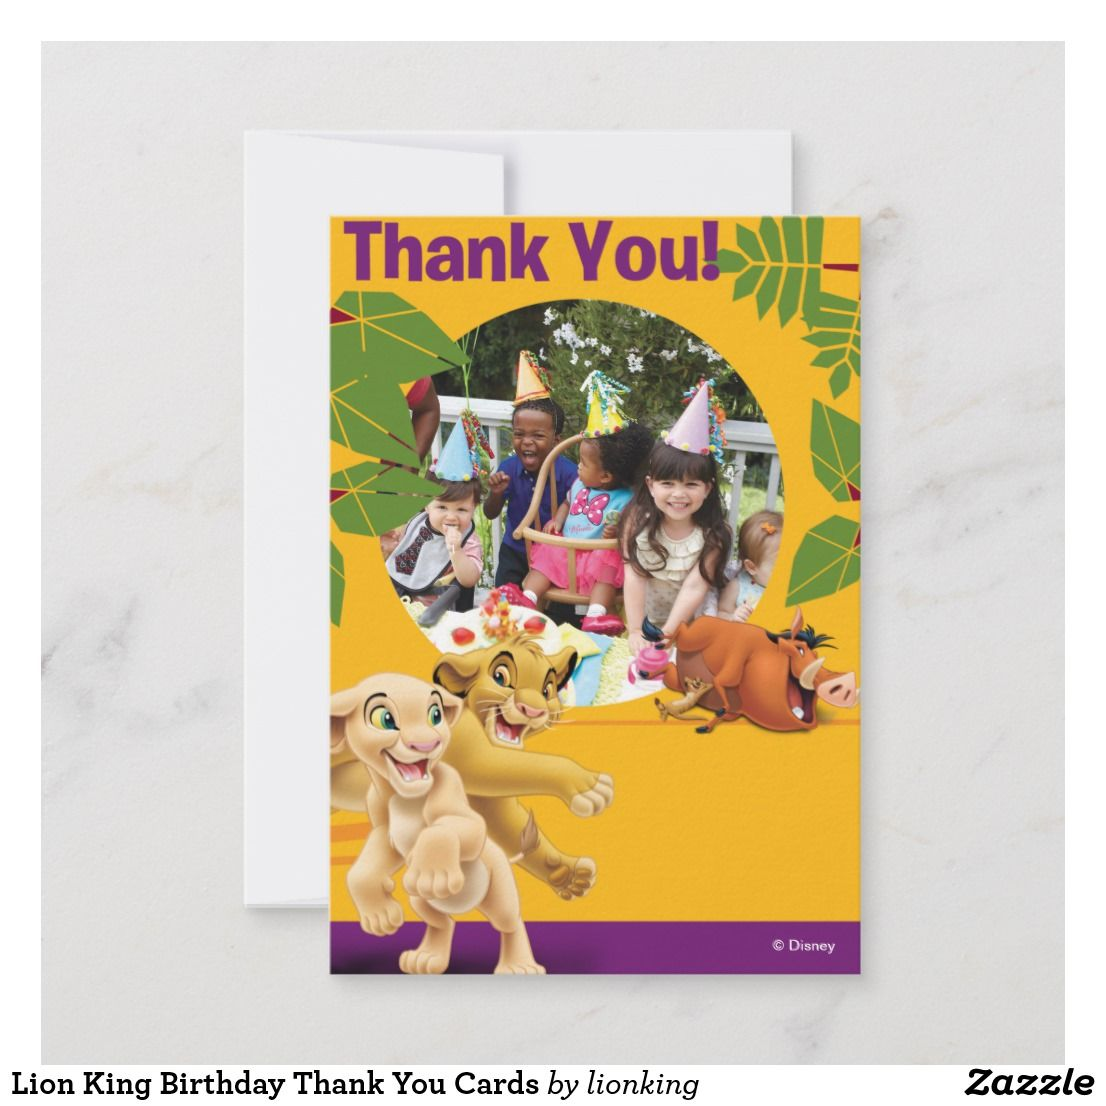 Lion King Birthday Thank You Cards Zazzle Com Birthday Thank You Cards Lion King Birthday King Birthday